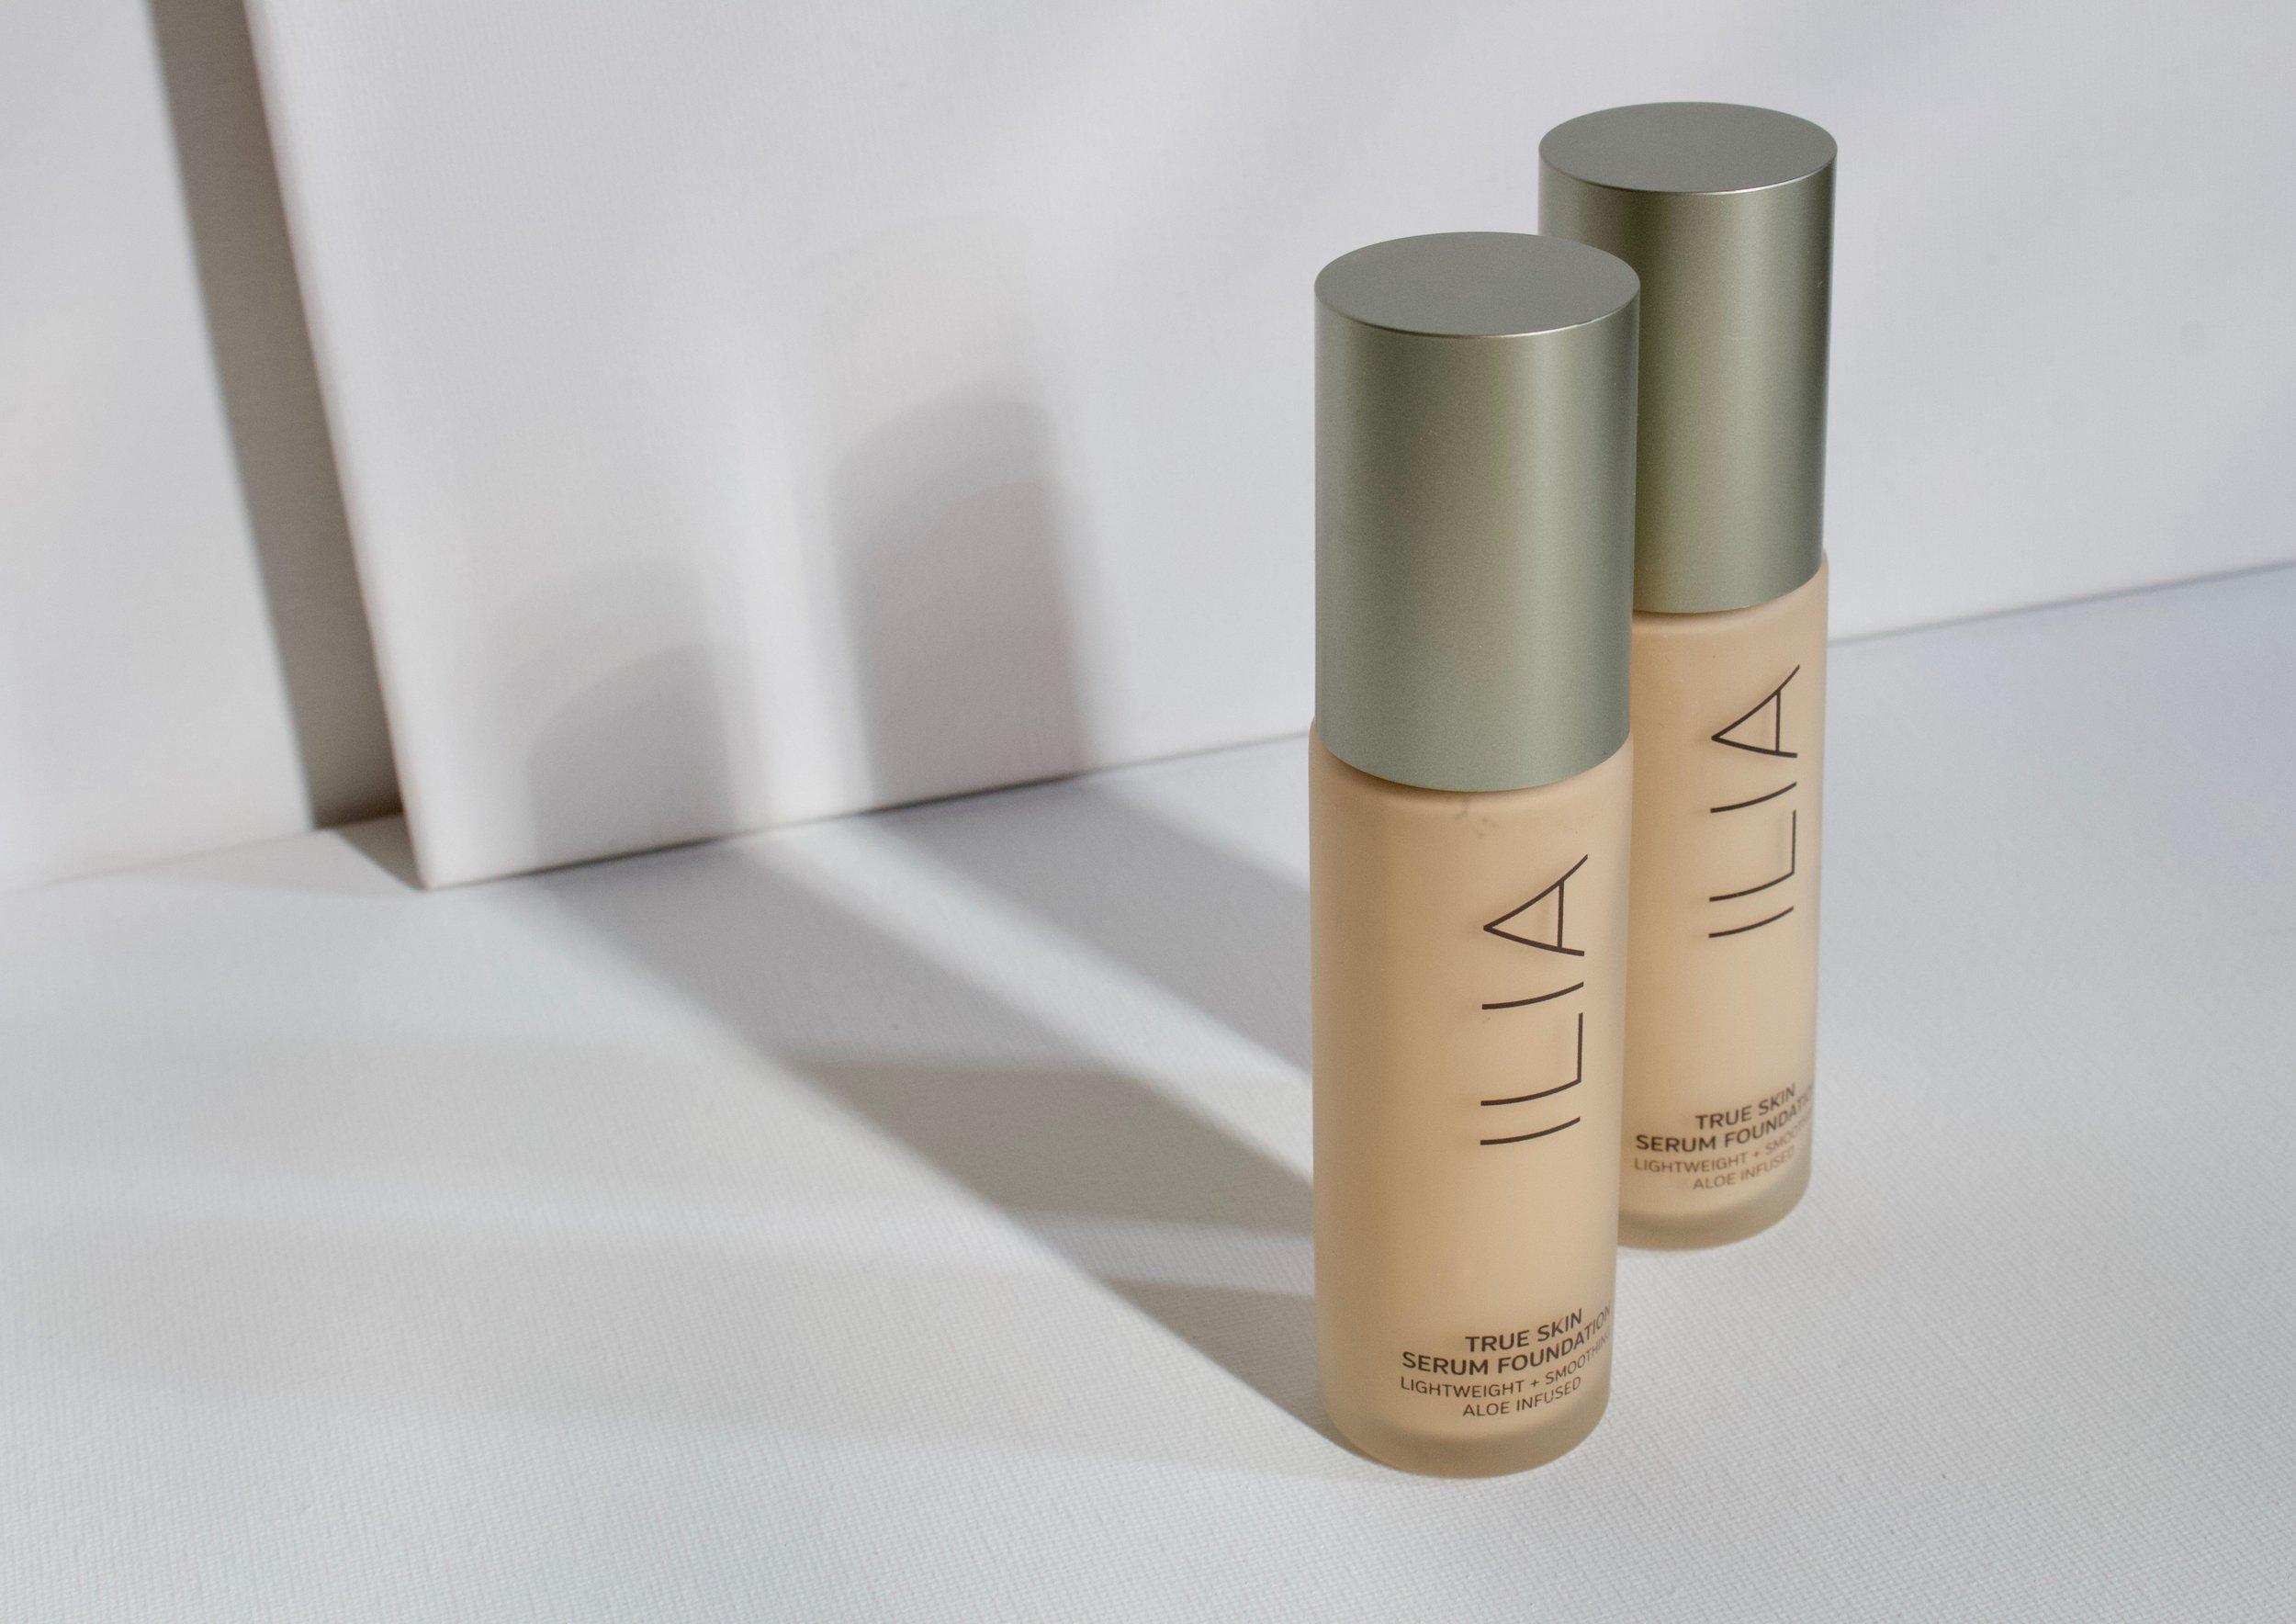 Ilia True Skin Serum Foundation: 1oz/ 30g for $54